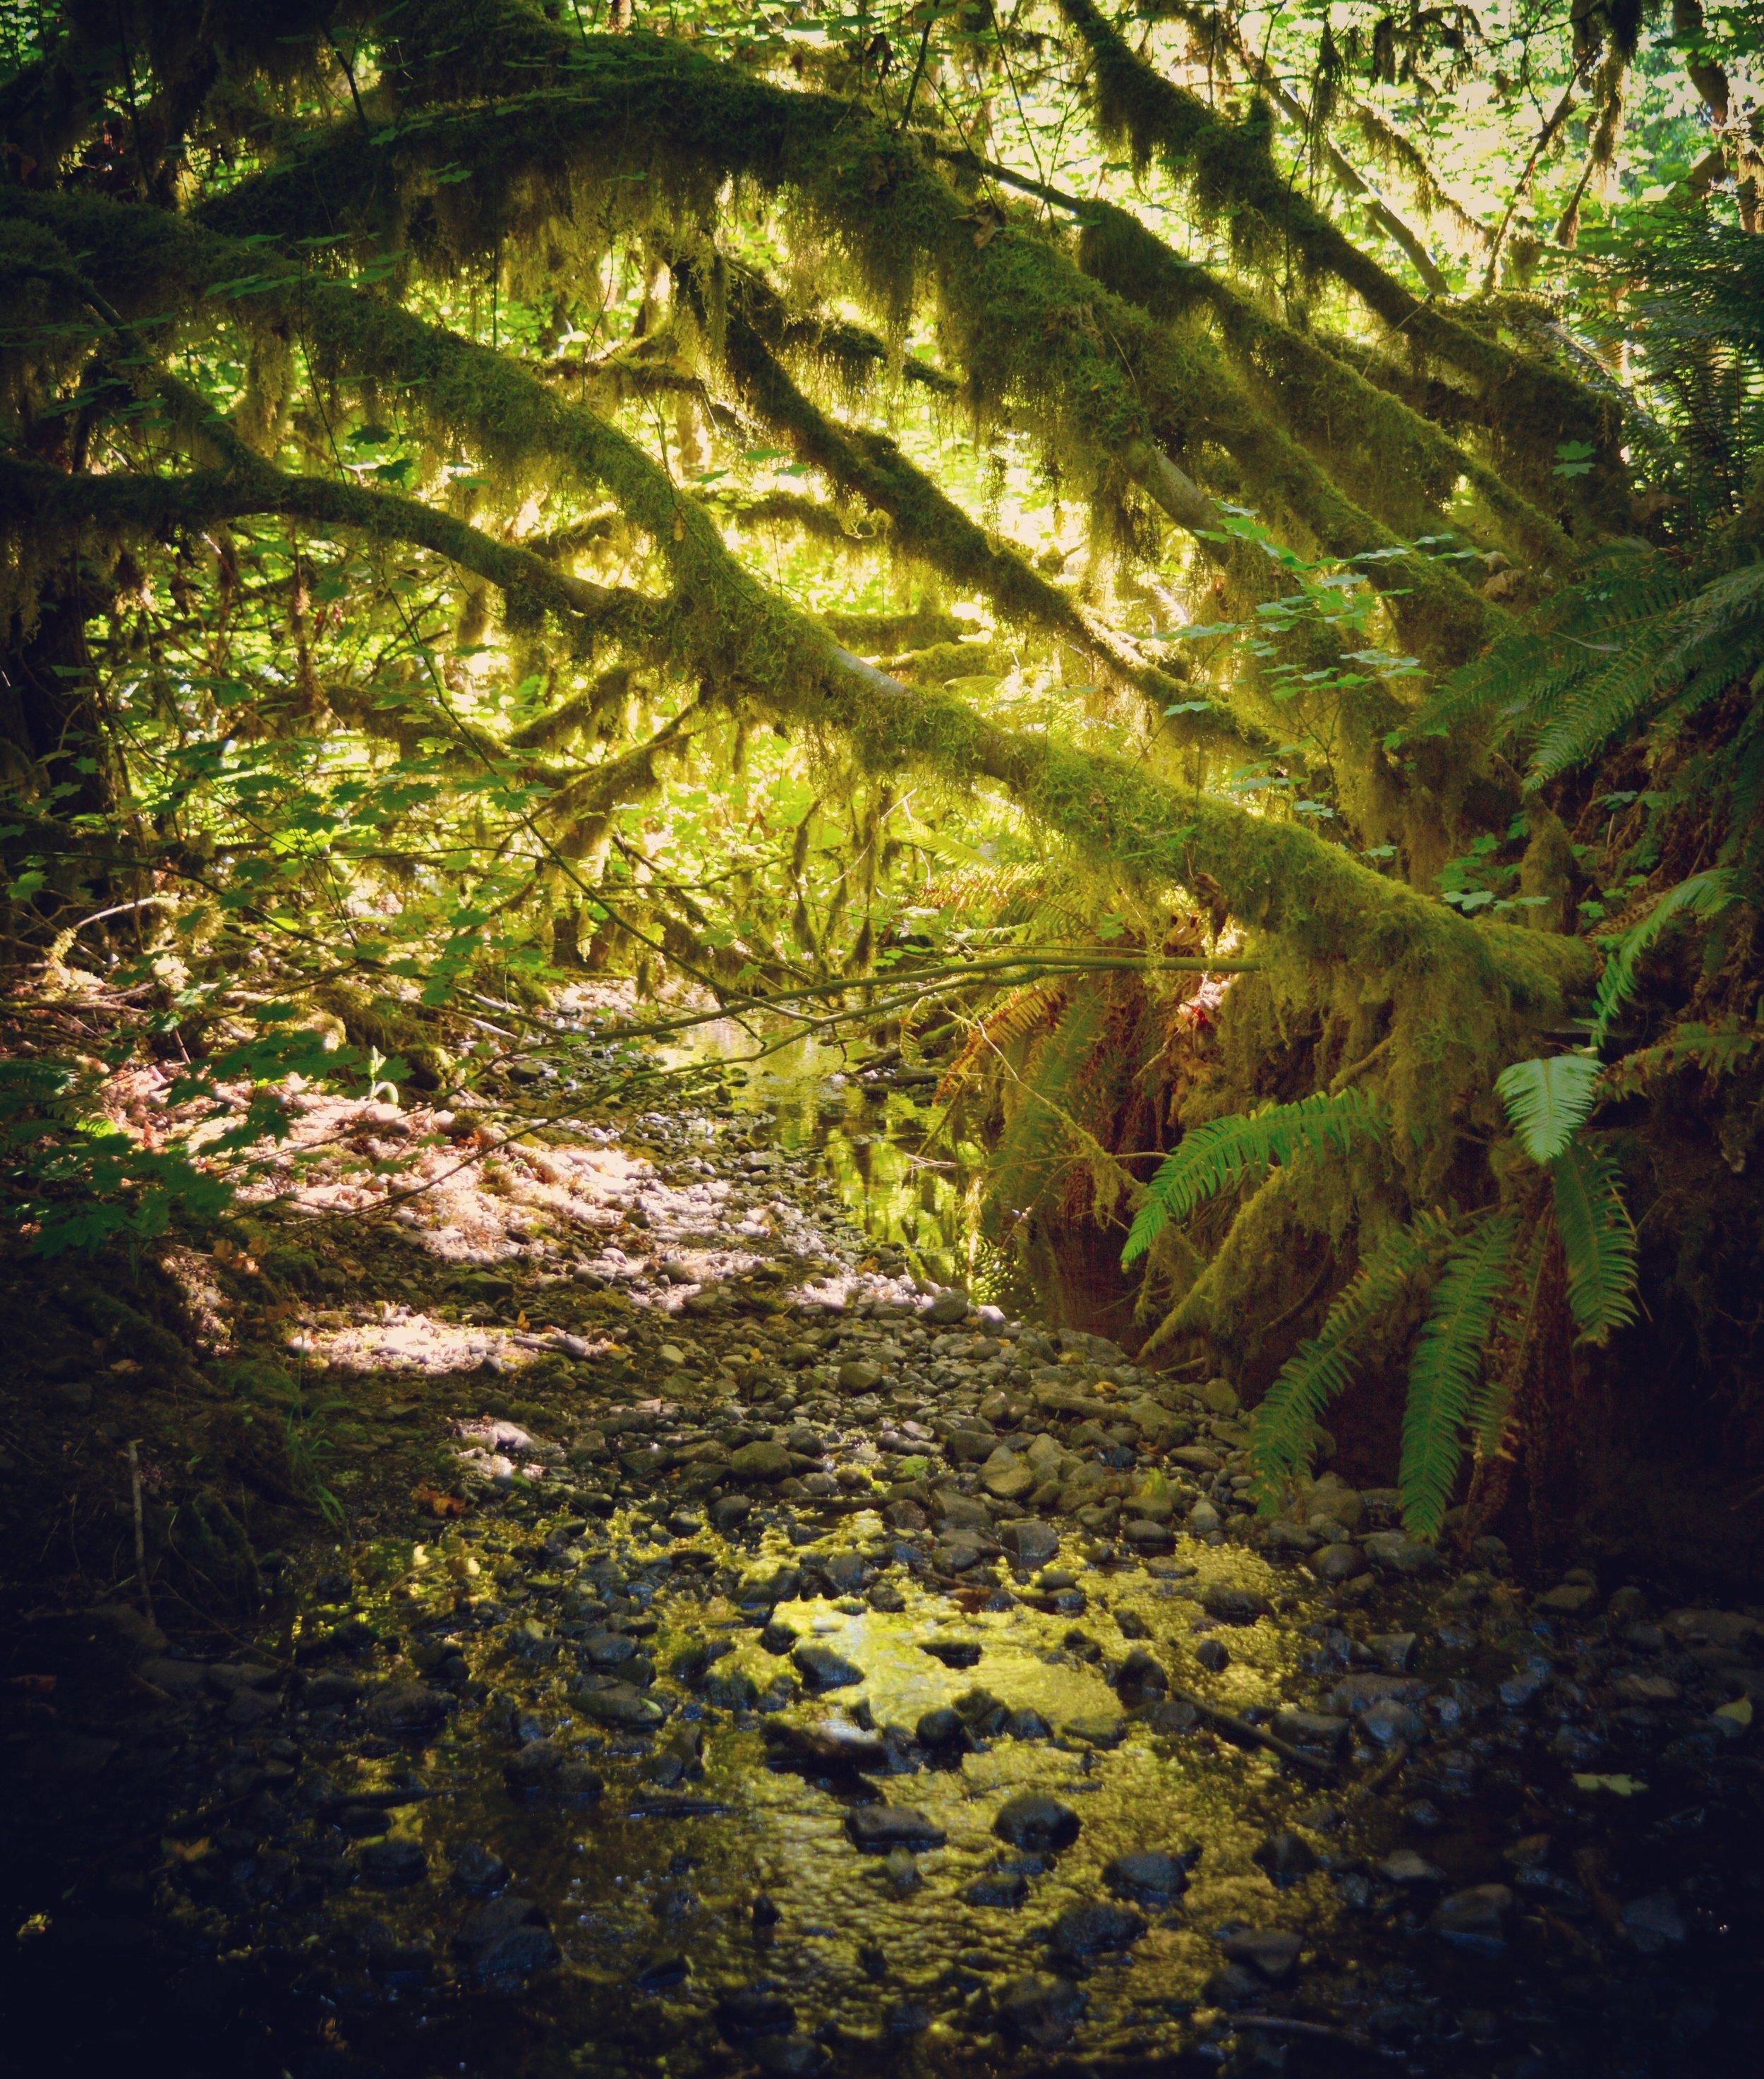 Oregon is green